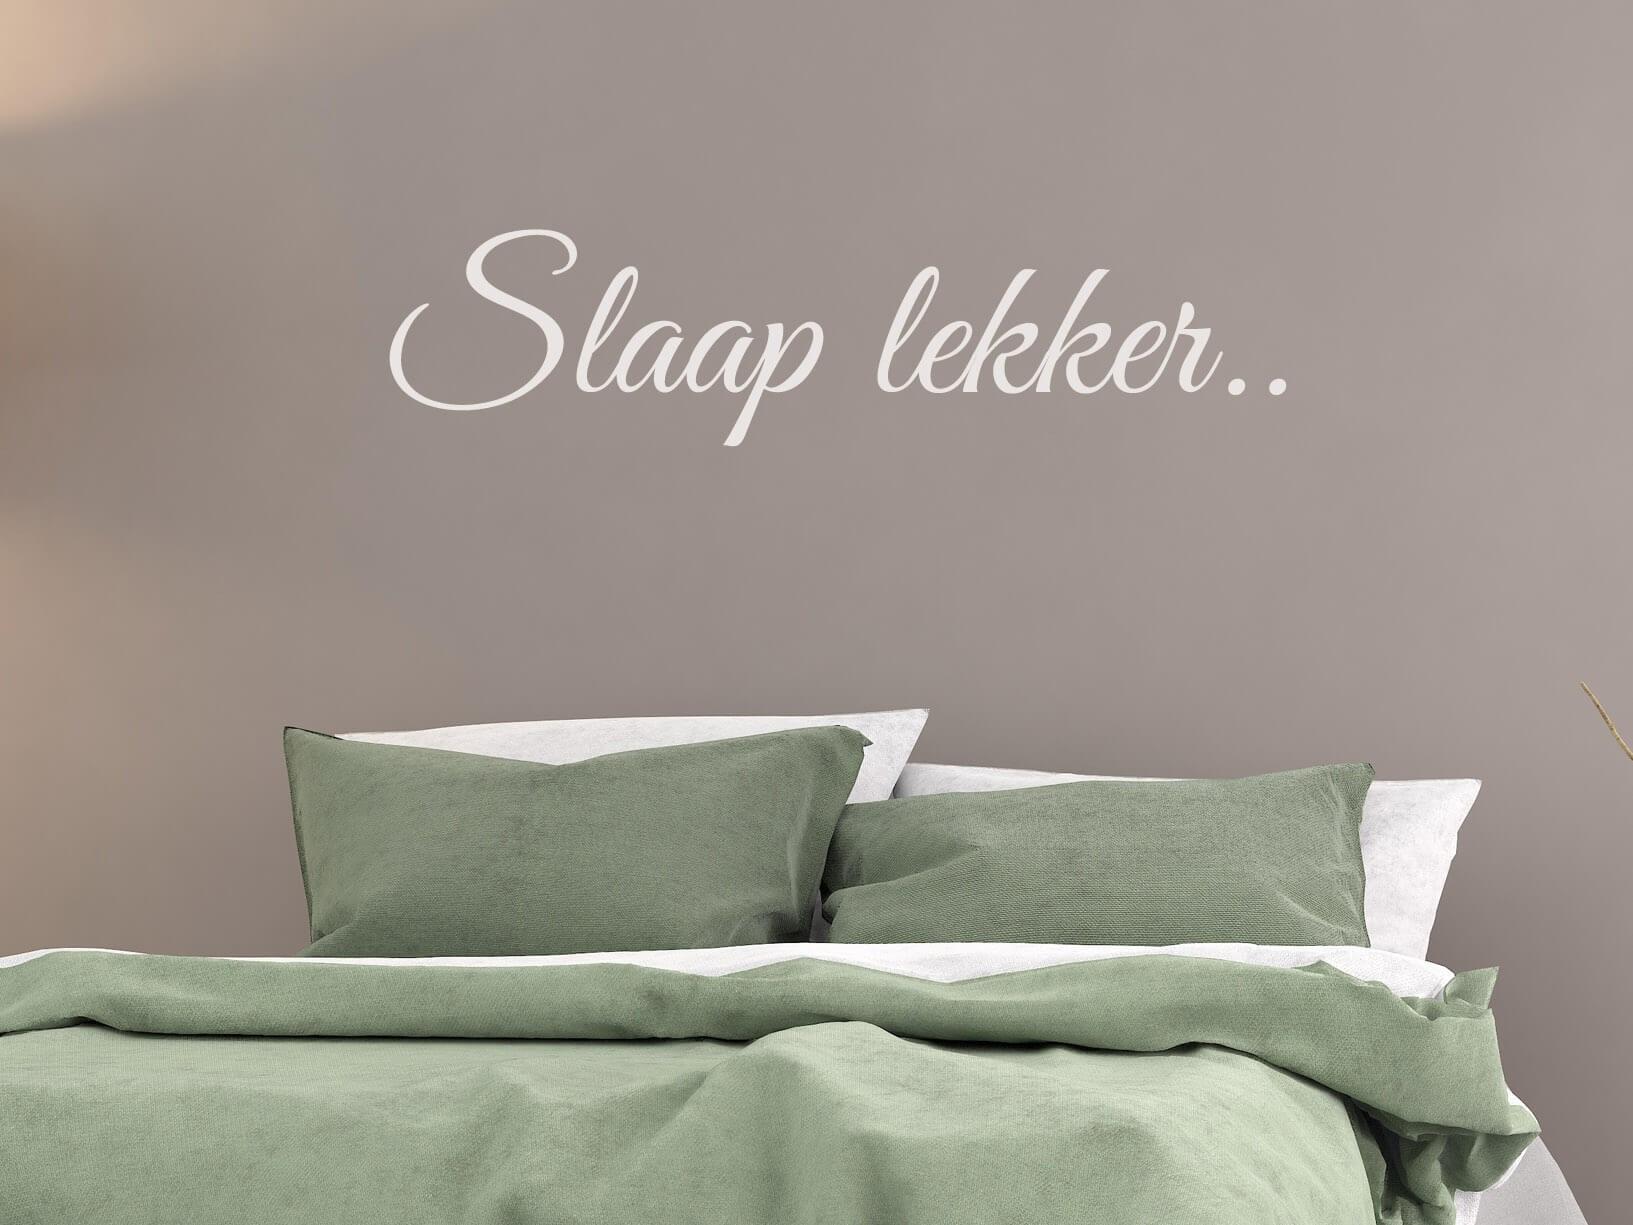 Muursticker Slaap lekker